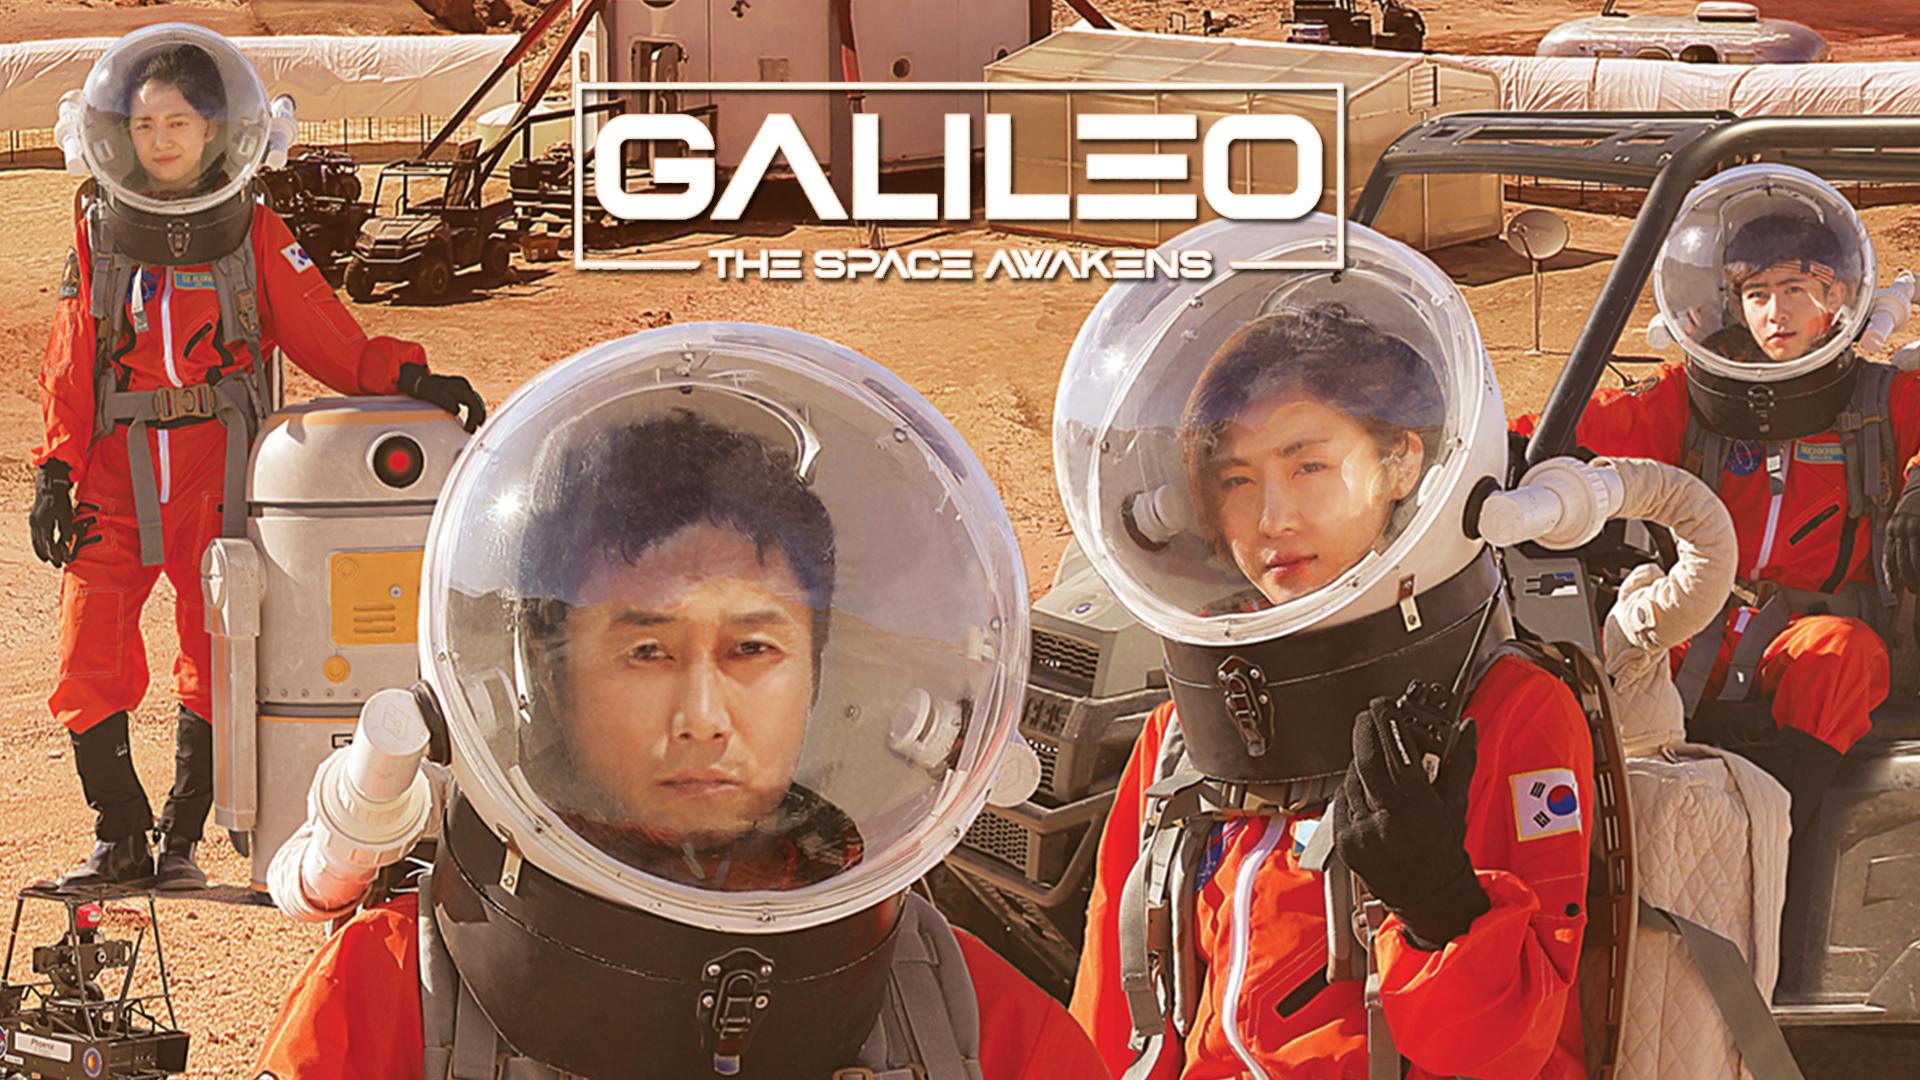 GALILEO: THE SPACE AWAKENS